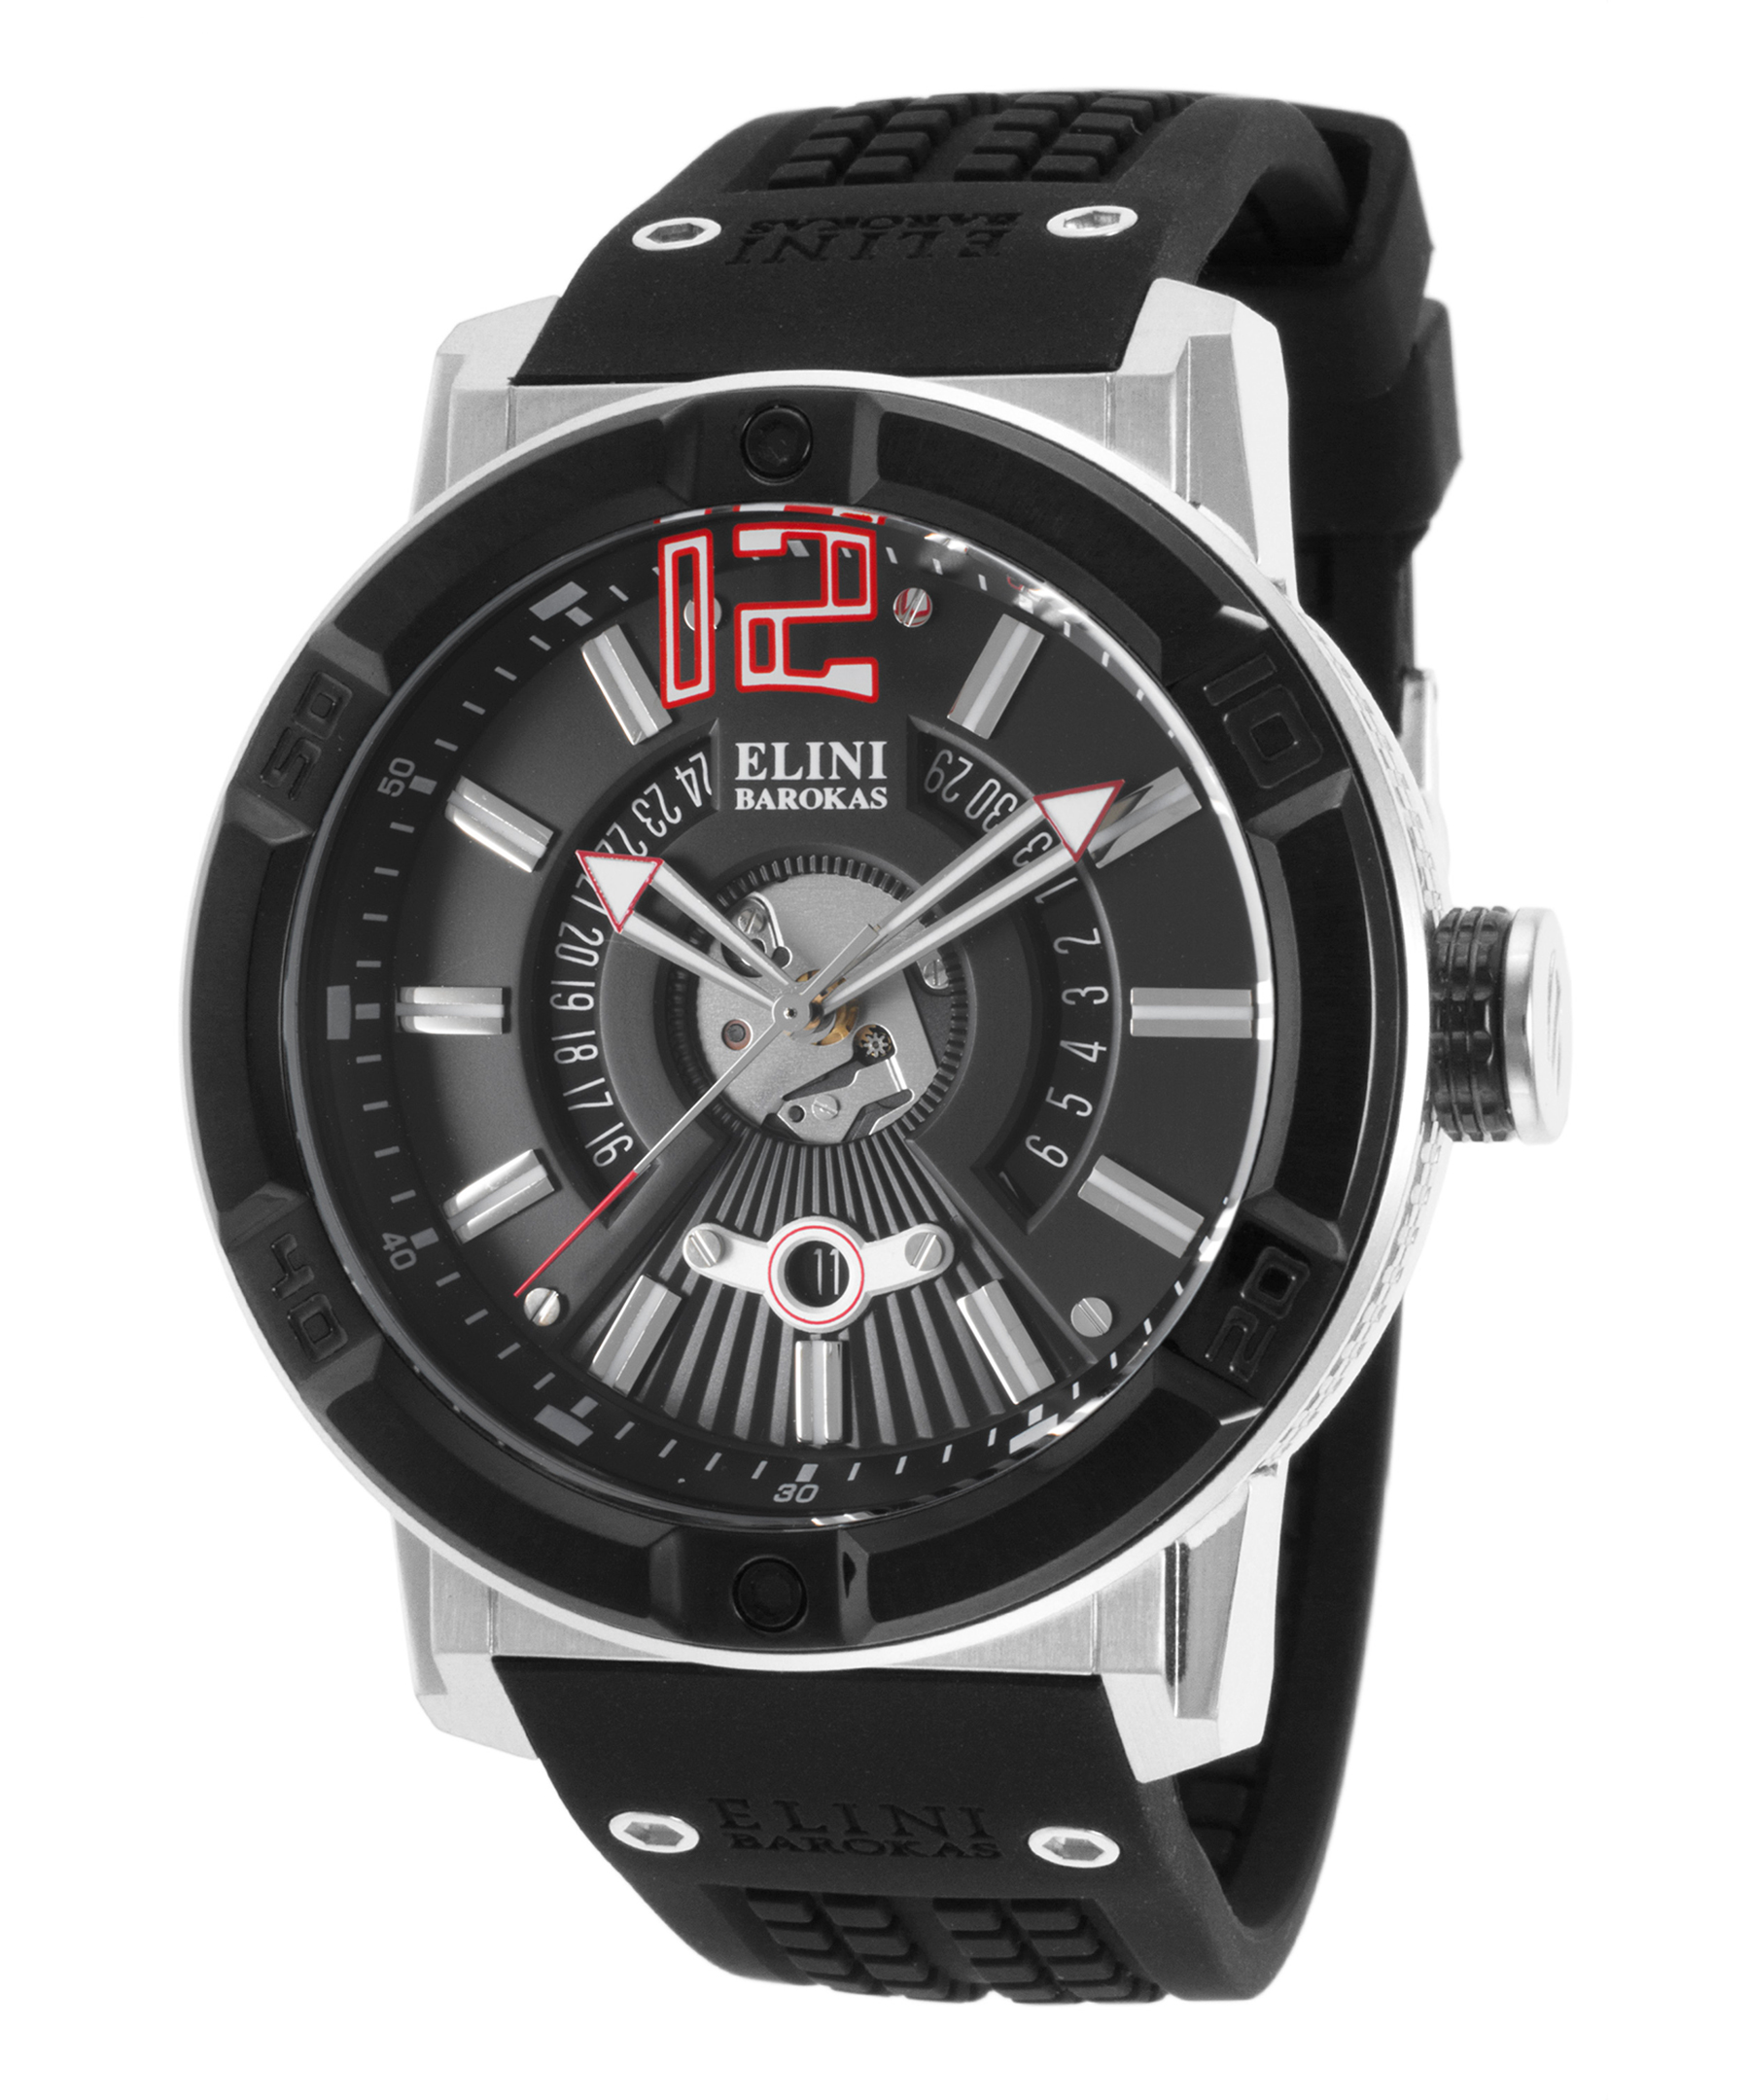 Elini Barokas 20002-01-Bb Spirit Black Silicone And Dial Ss Case Watch